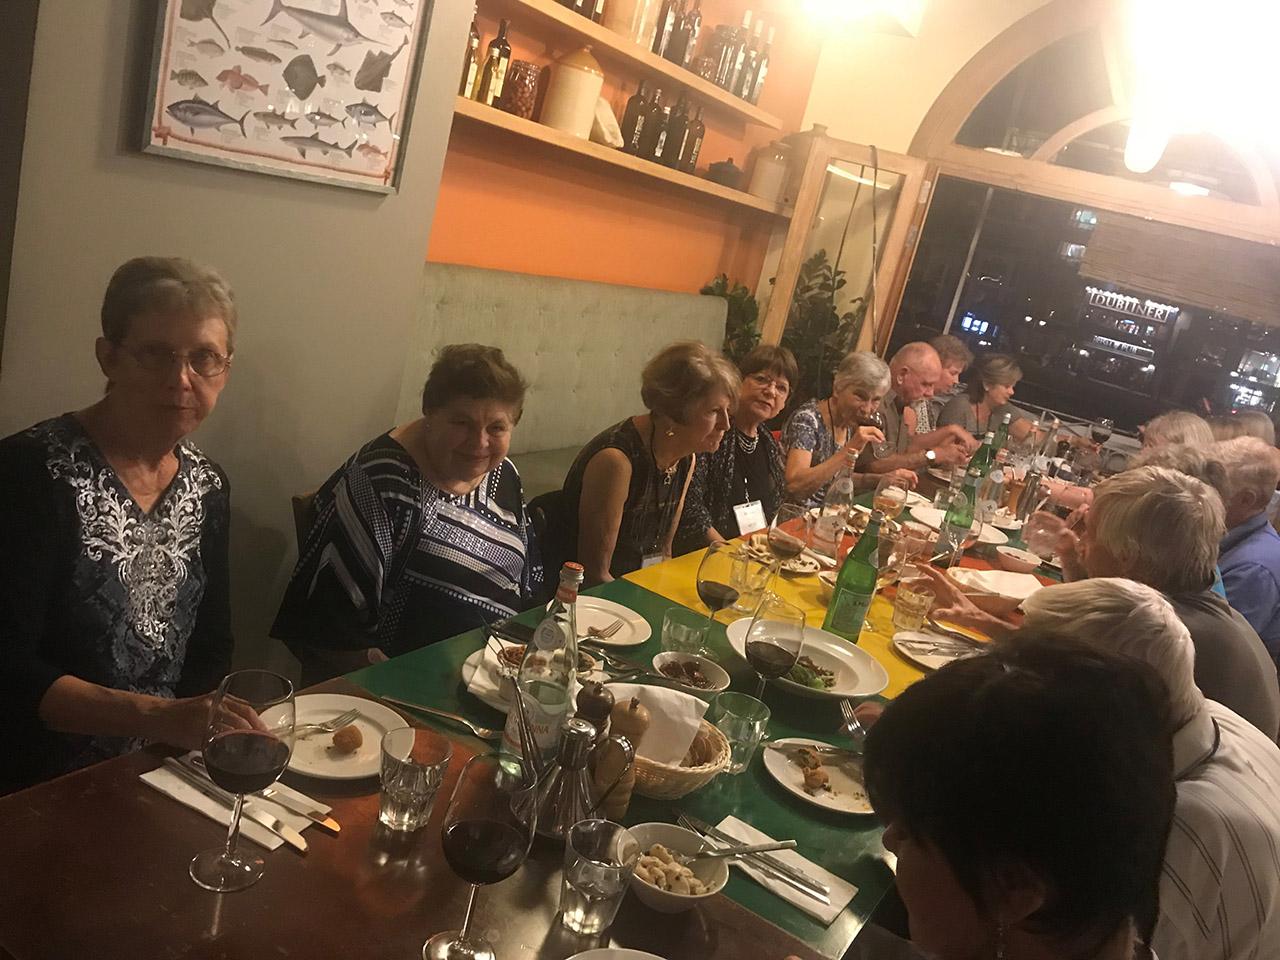 Travelers dinning